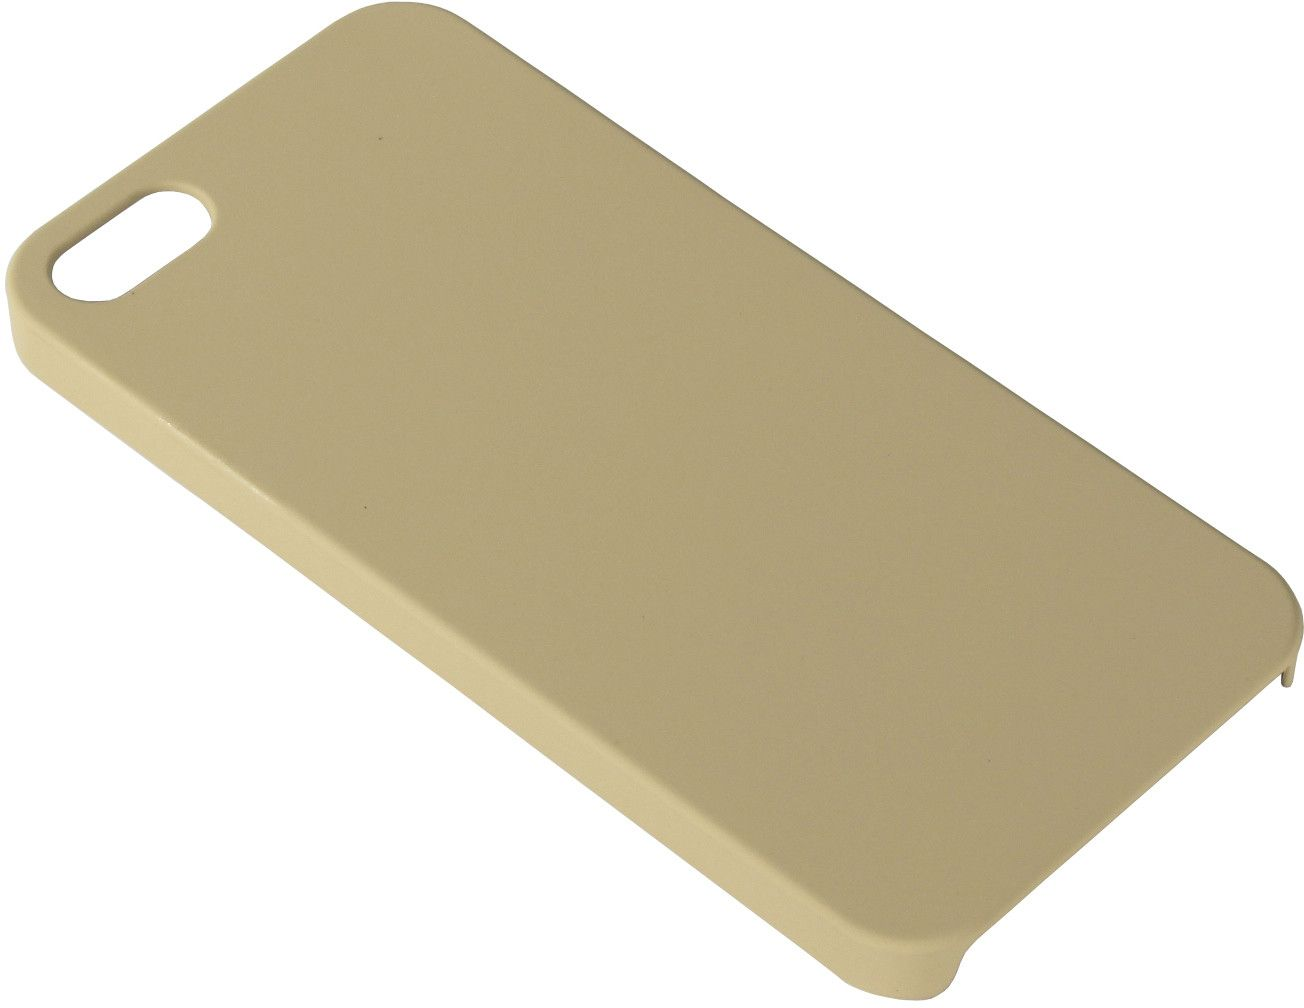 Gear Hard Case (iPhone 5/5S/SE) - Beige